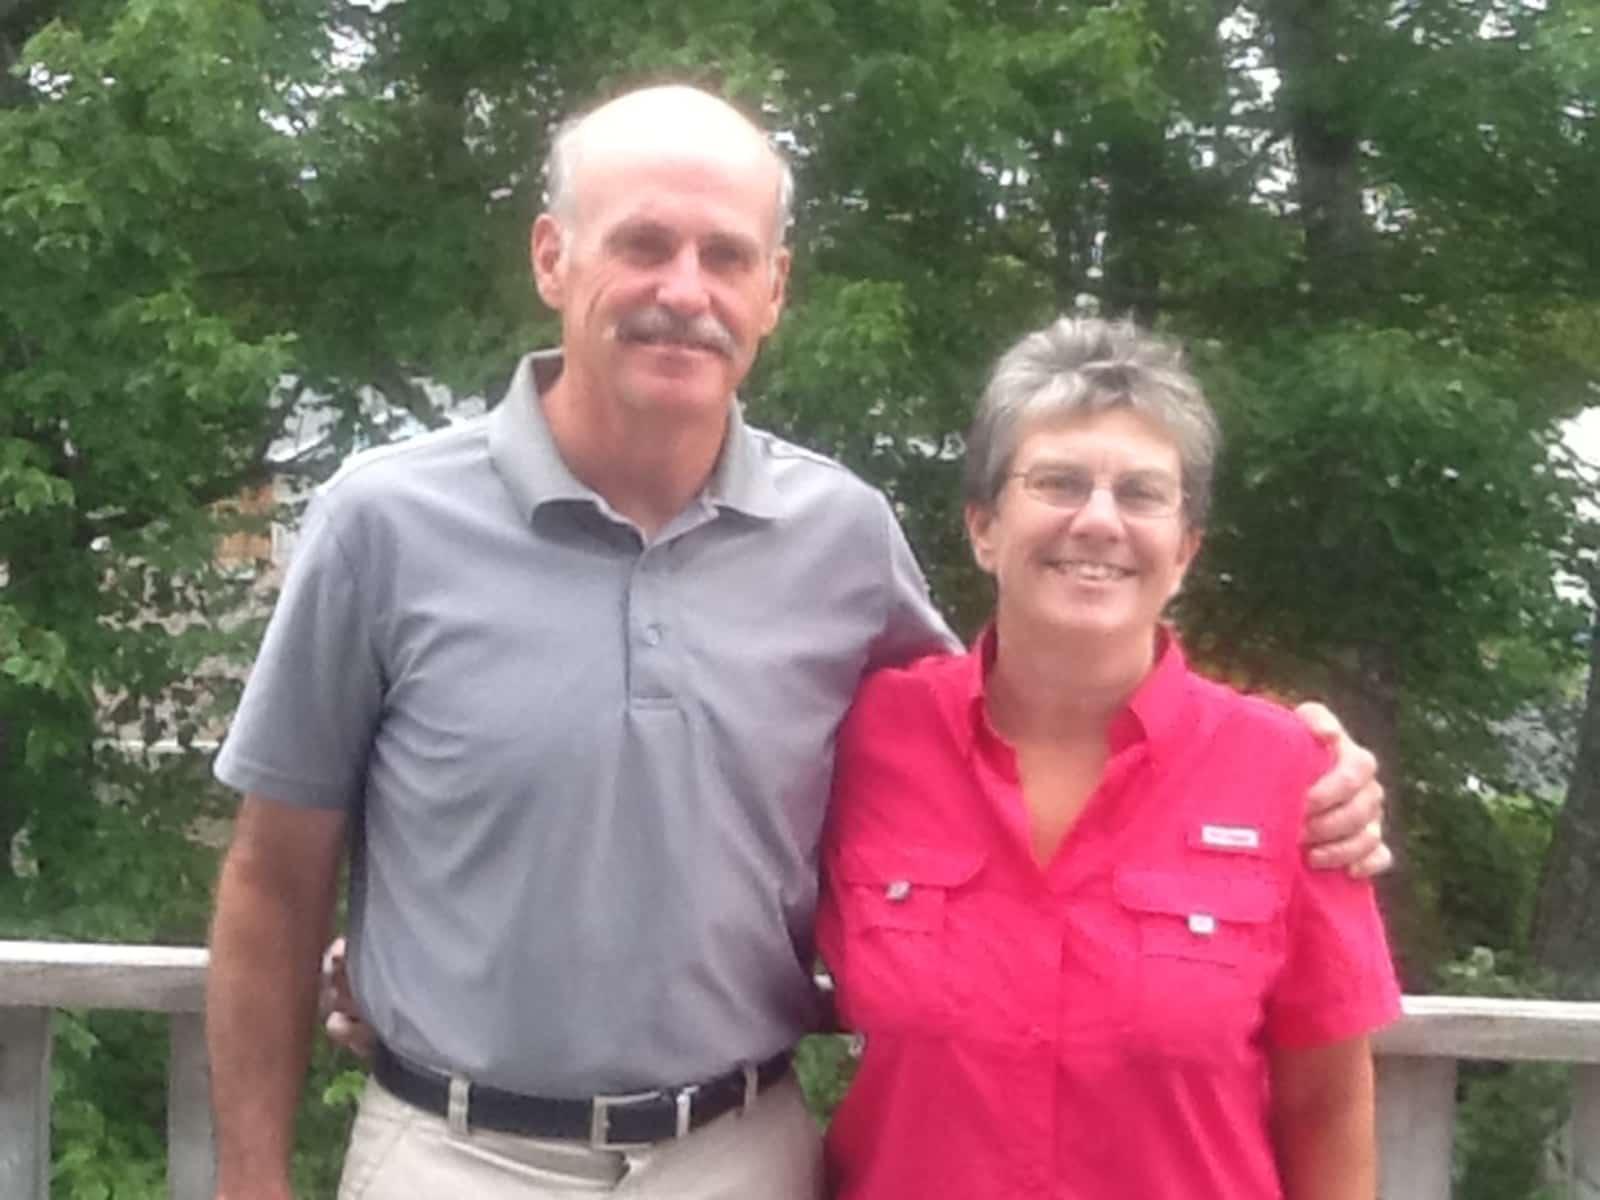 Al & loretta & Loretta from Halifax, Nova Scotia, Canada